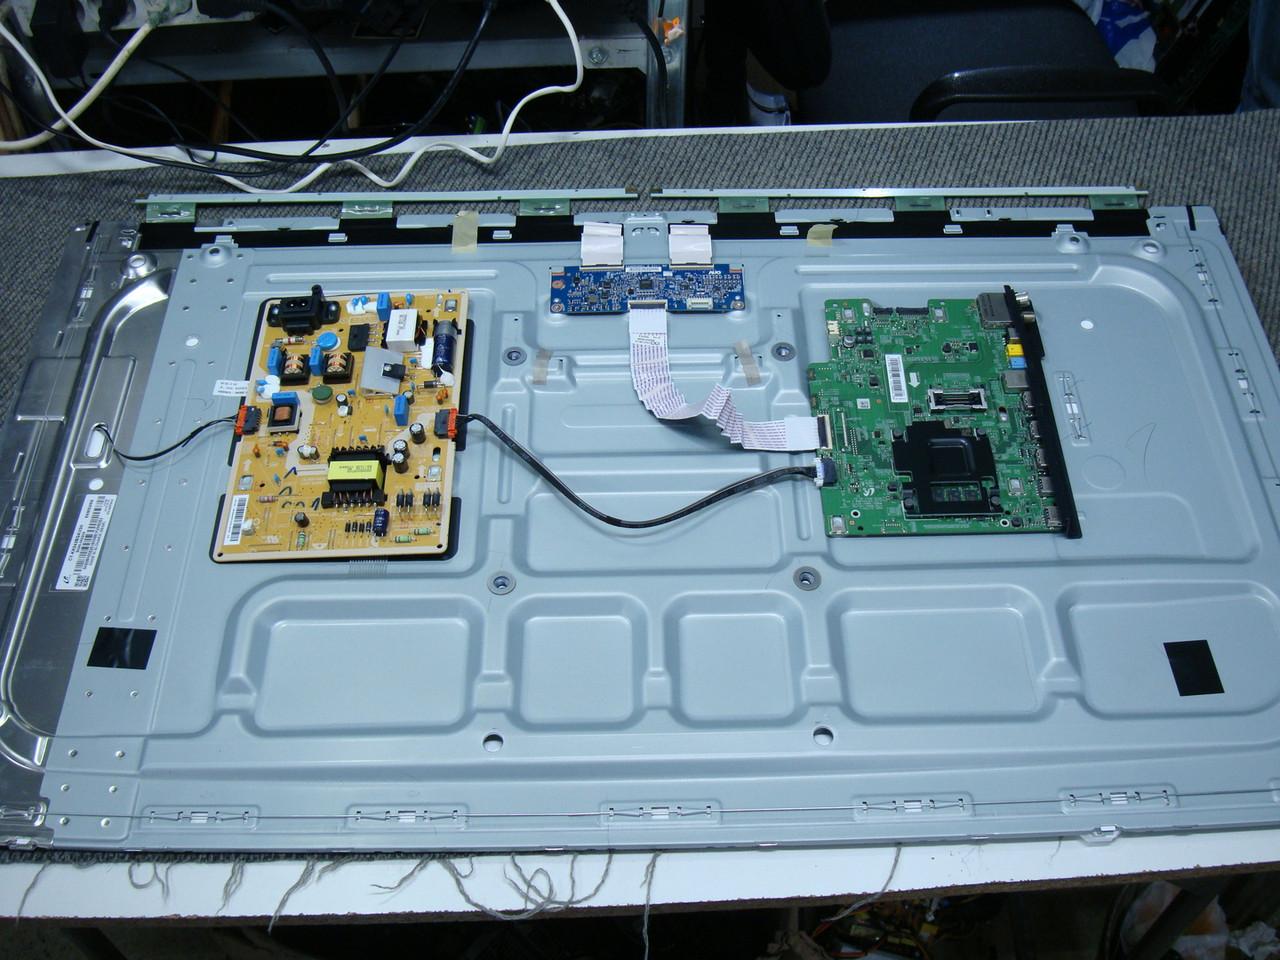 Запчасти к телевизору Samsung UE43M5572AU (BN41-02575, BN44-00871C L40E1R_KDY, t430hvn01.6 43T01-C04)